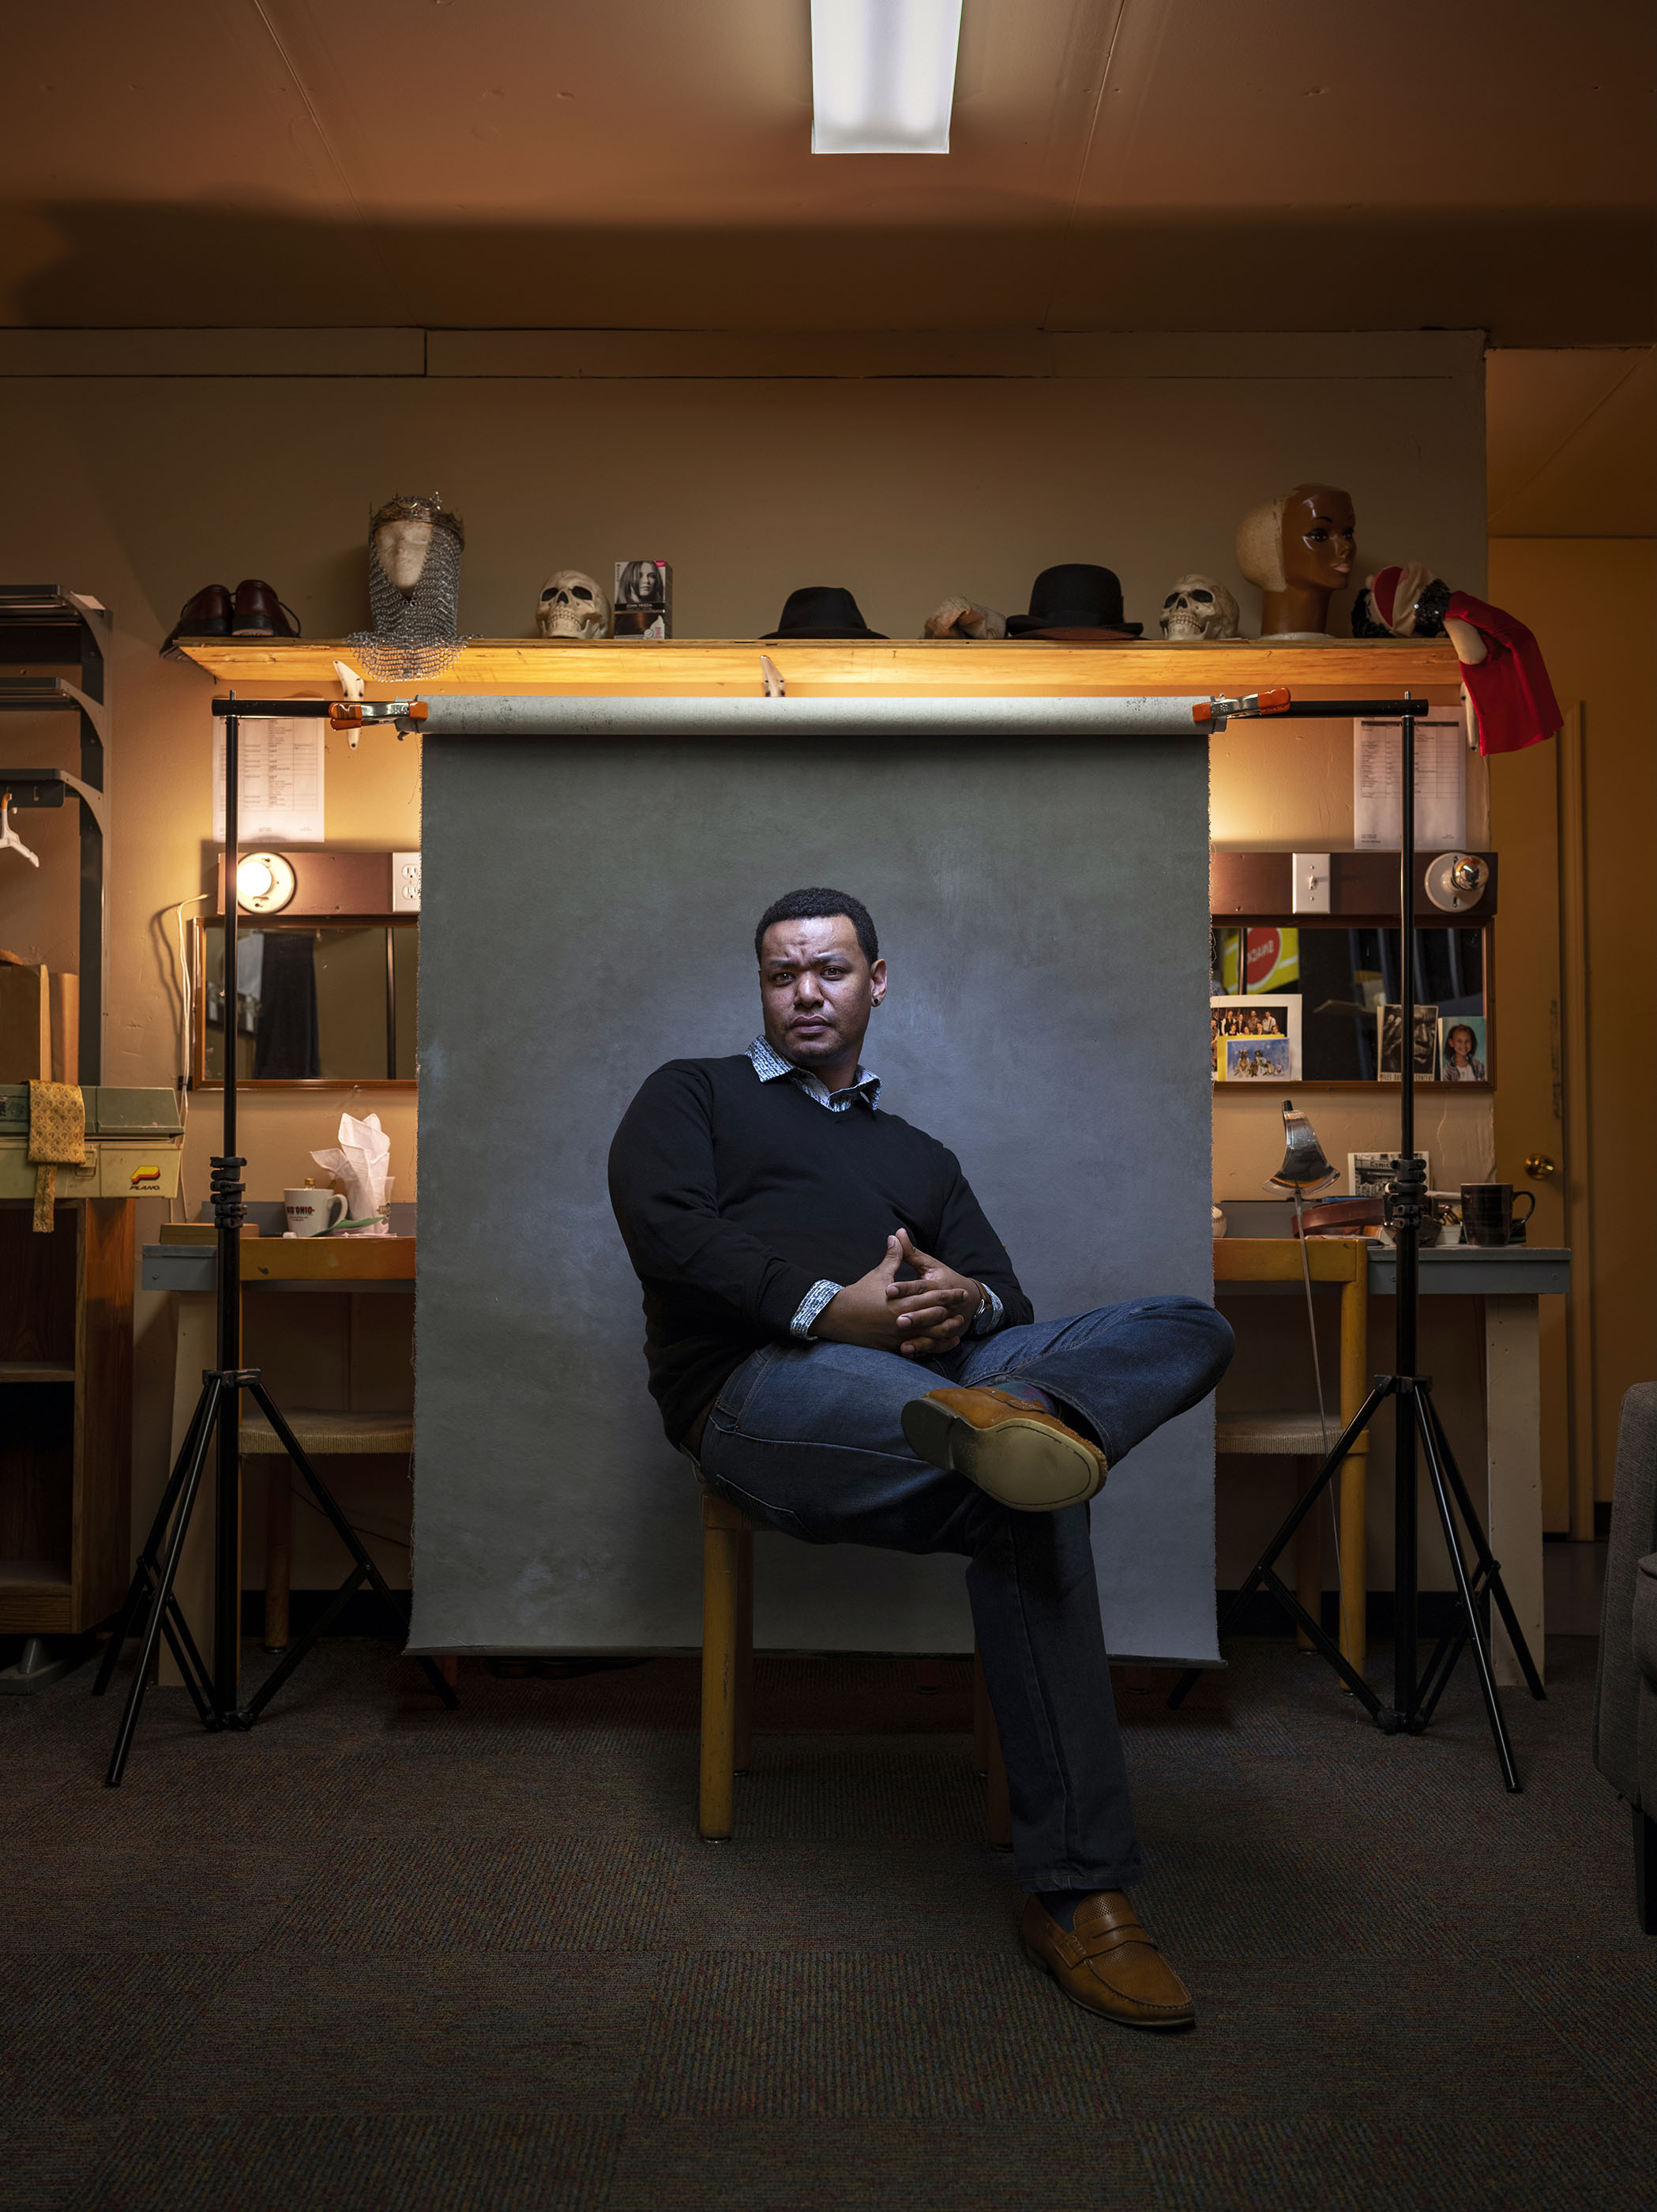 Portrait of Kansas City actor Keenan Ramos inside the dressing room of Unicorn Theatre.